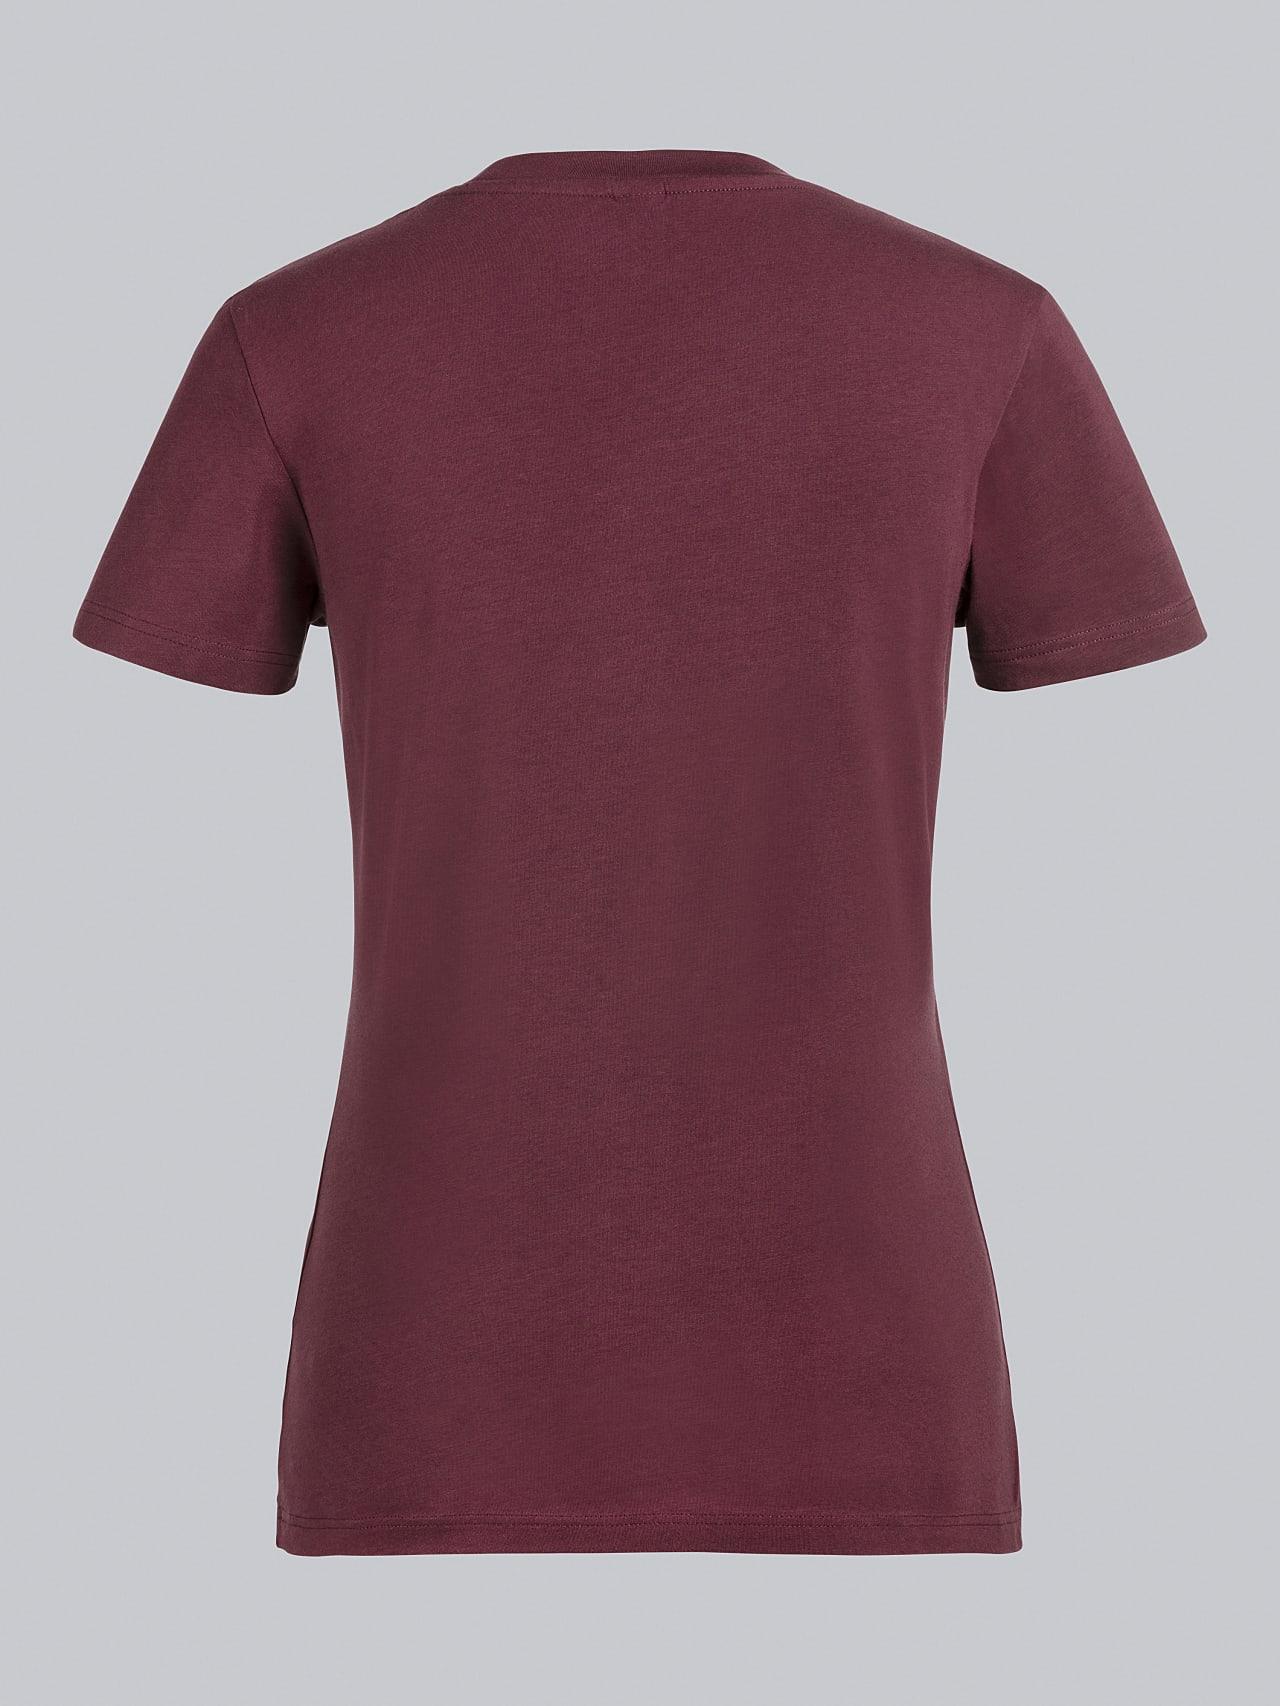 JANPA V1.Y5.02 Logo Print T-Shirt bordeaux Left Alpha Tauri